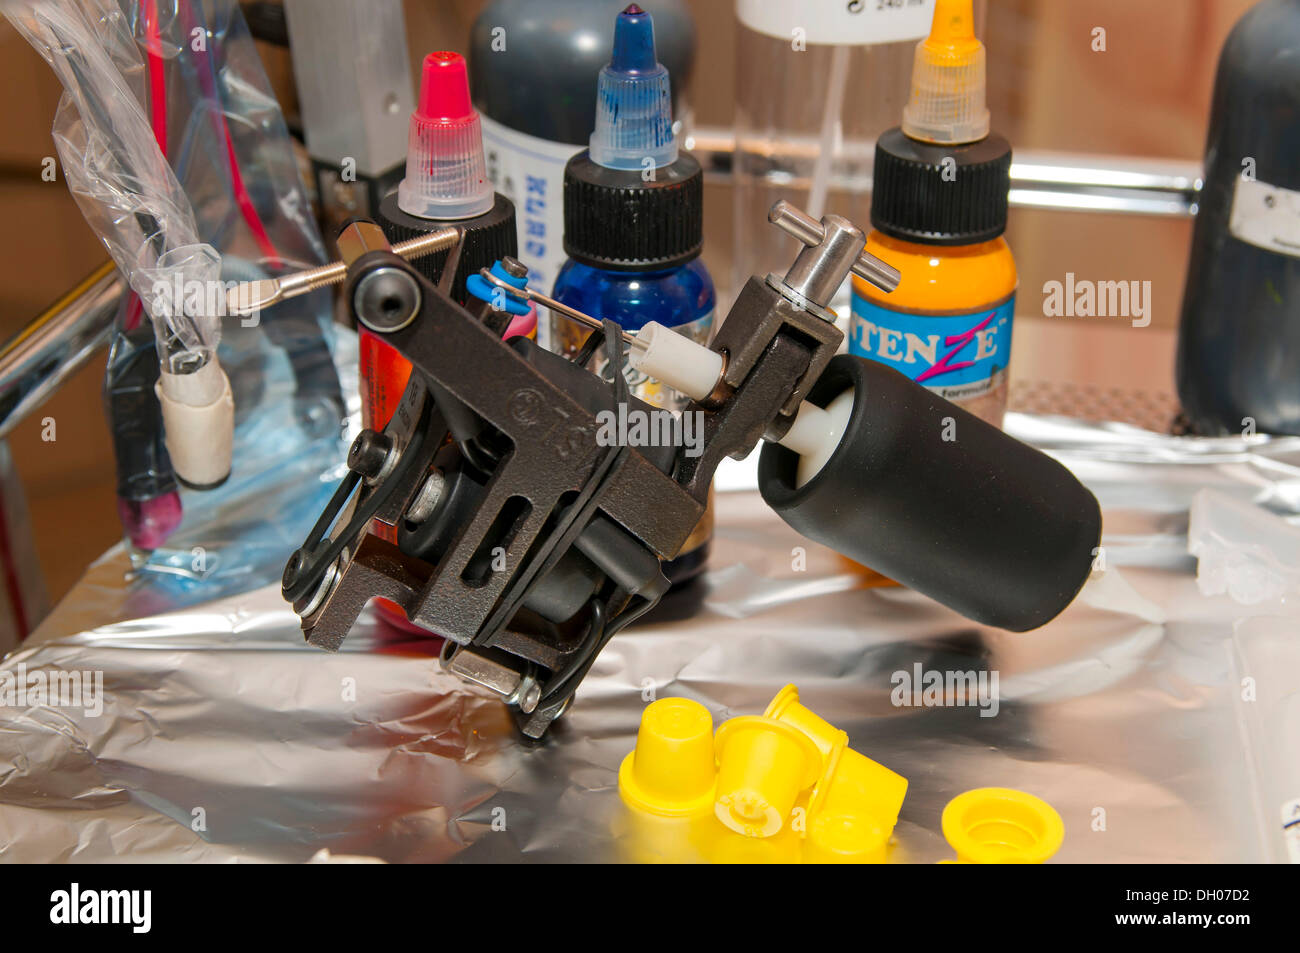 Workplace with a Micky Sharpz Model 007 Iron Hybrid tattoo machine